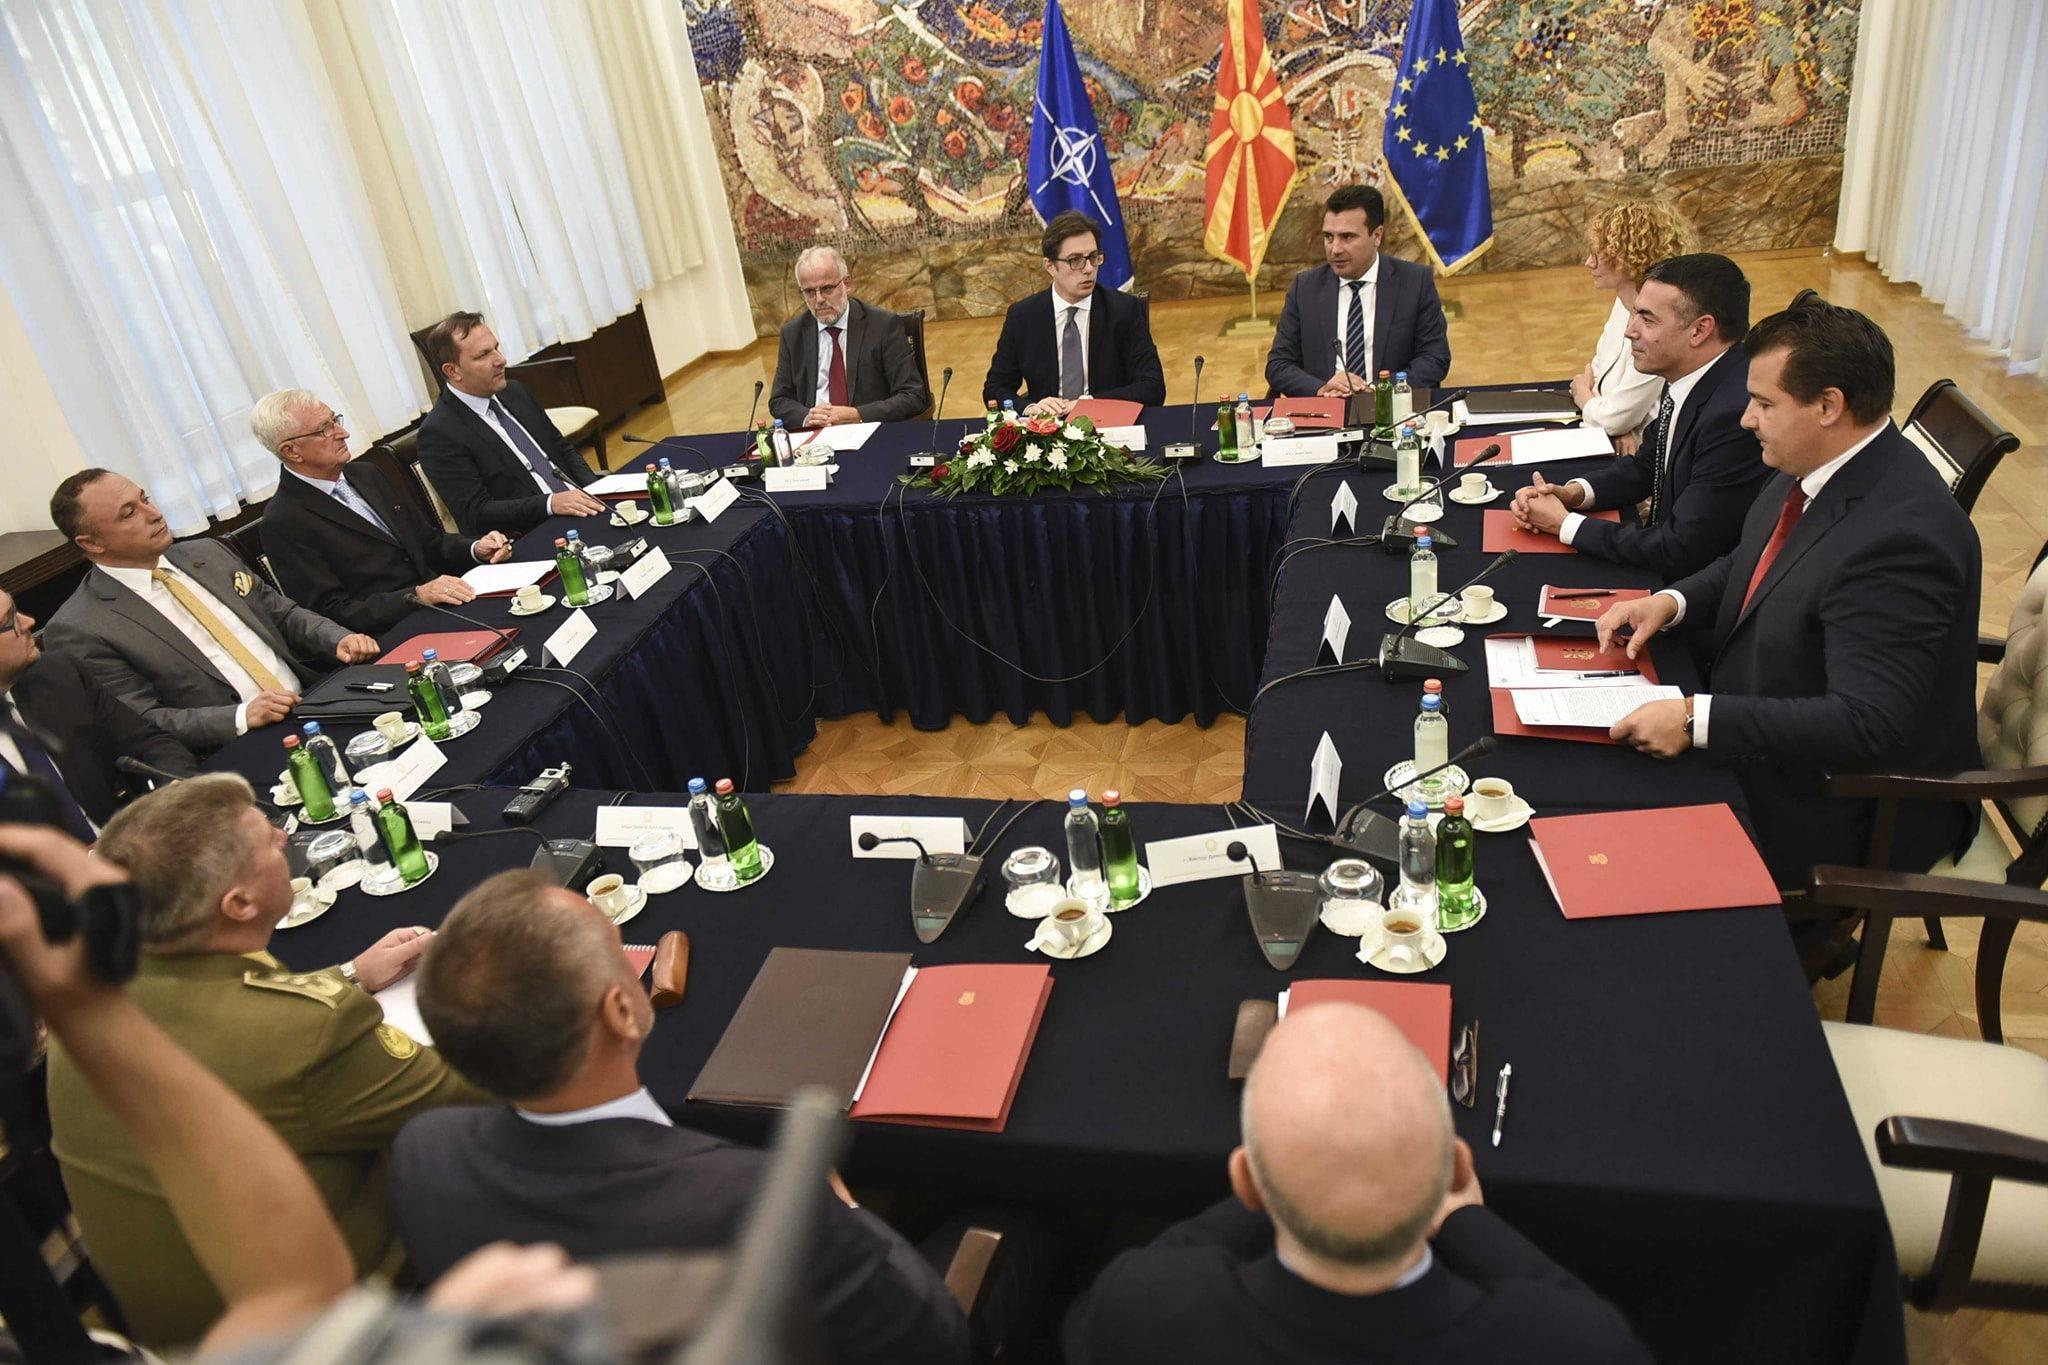 Pendarovski: Η Βόρεια Μακεδονία μπορεί να έρθει αντιμέτωπη με δύσκολες καταστάσεις